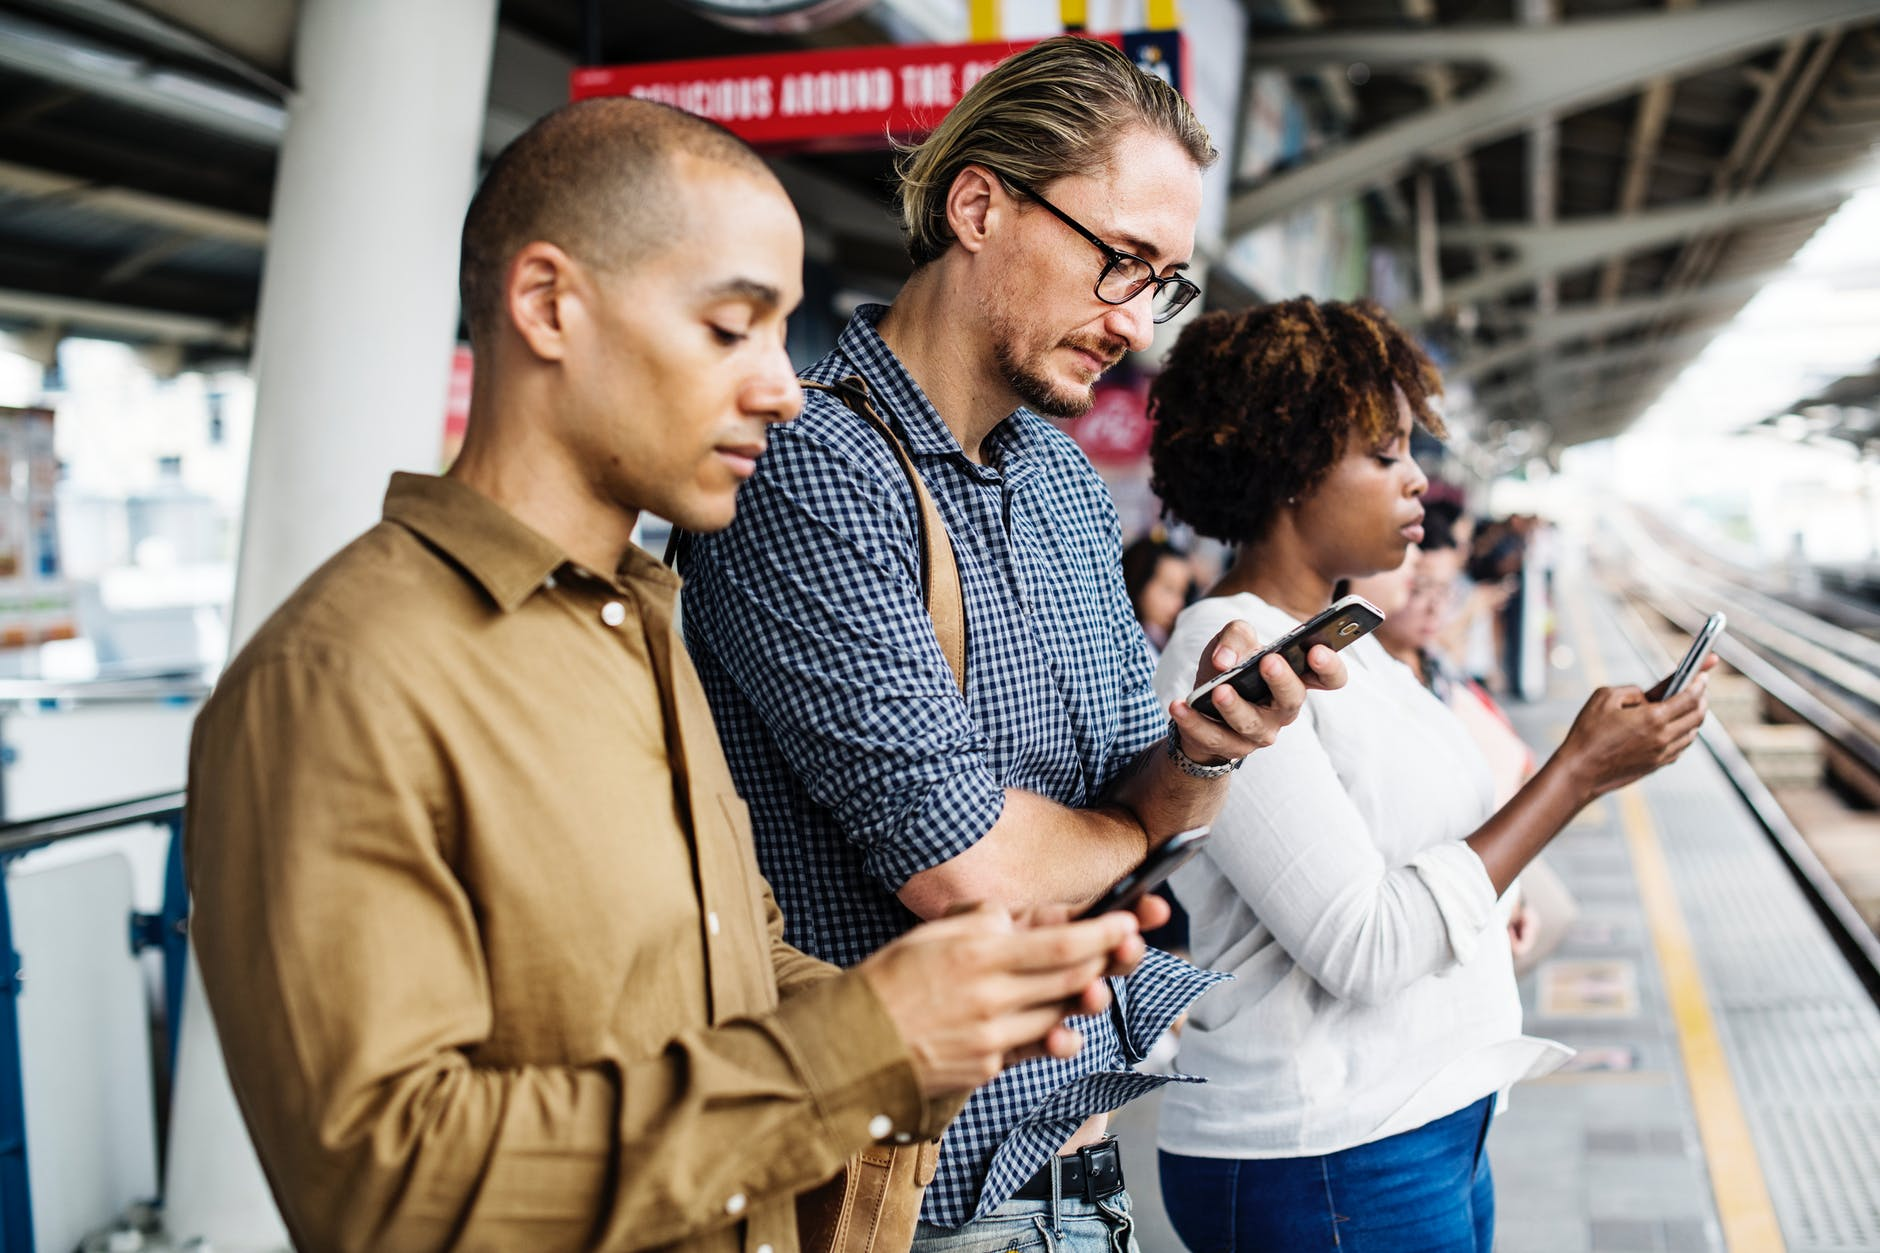 Smartphone addiction is growing